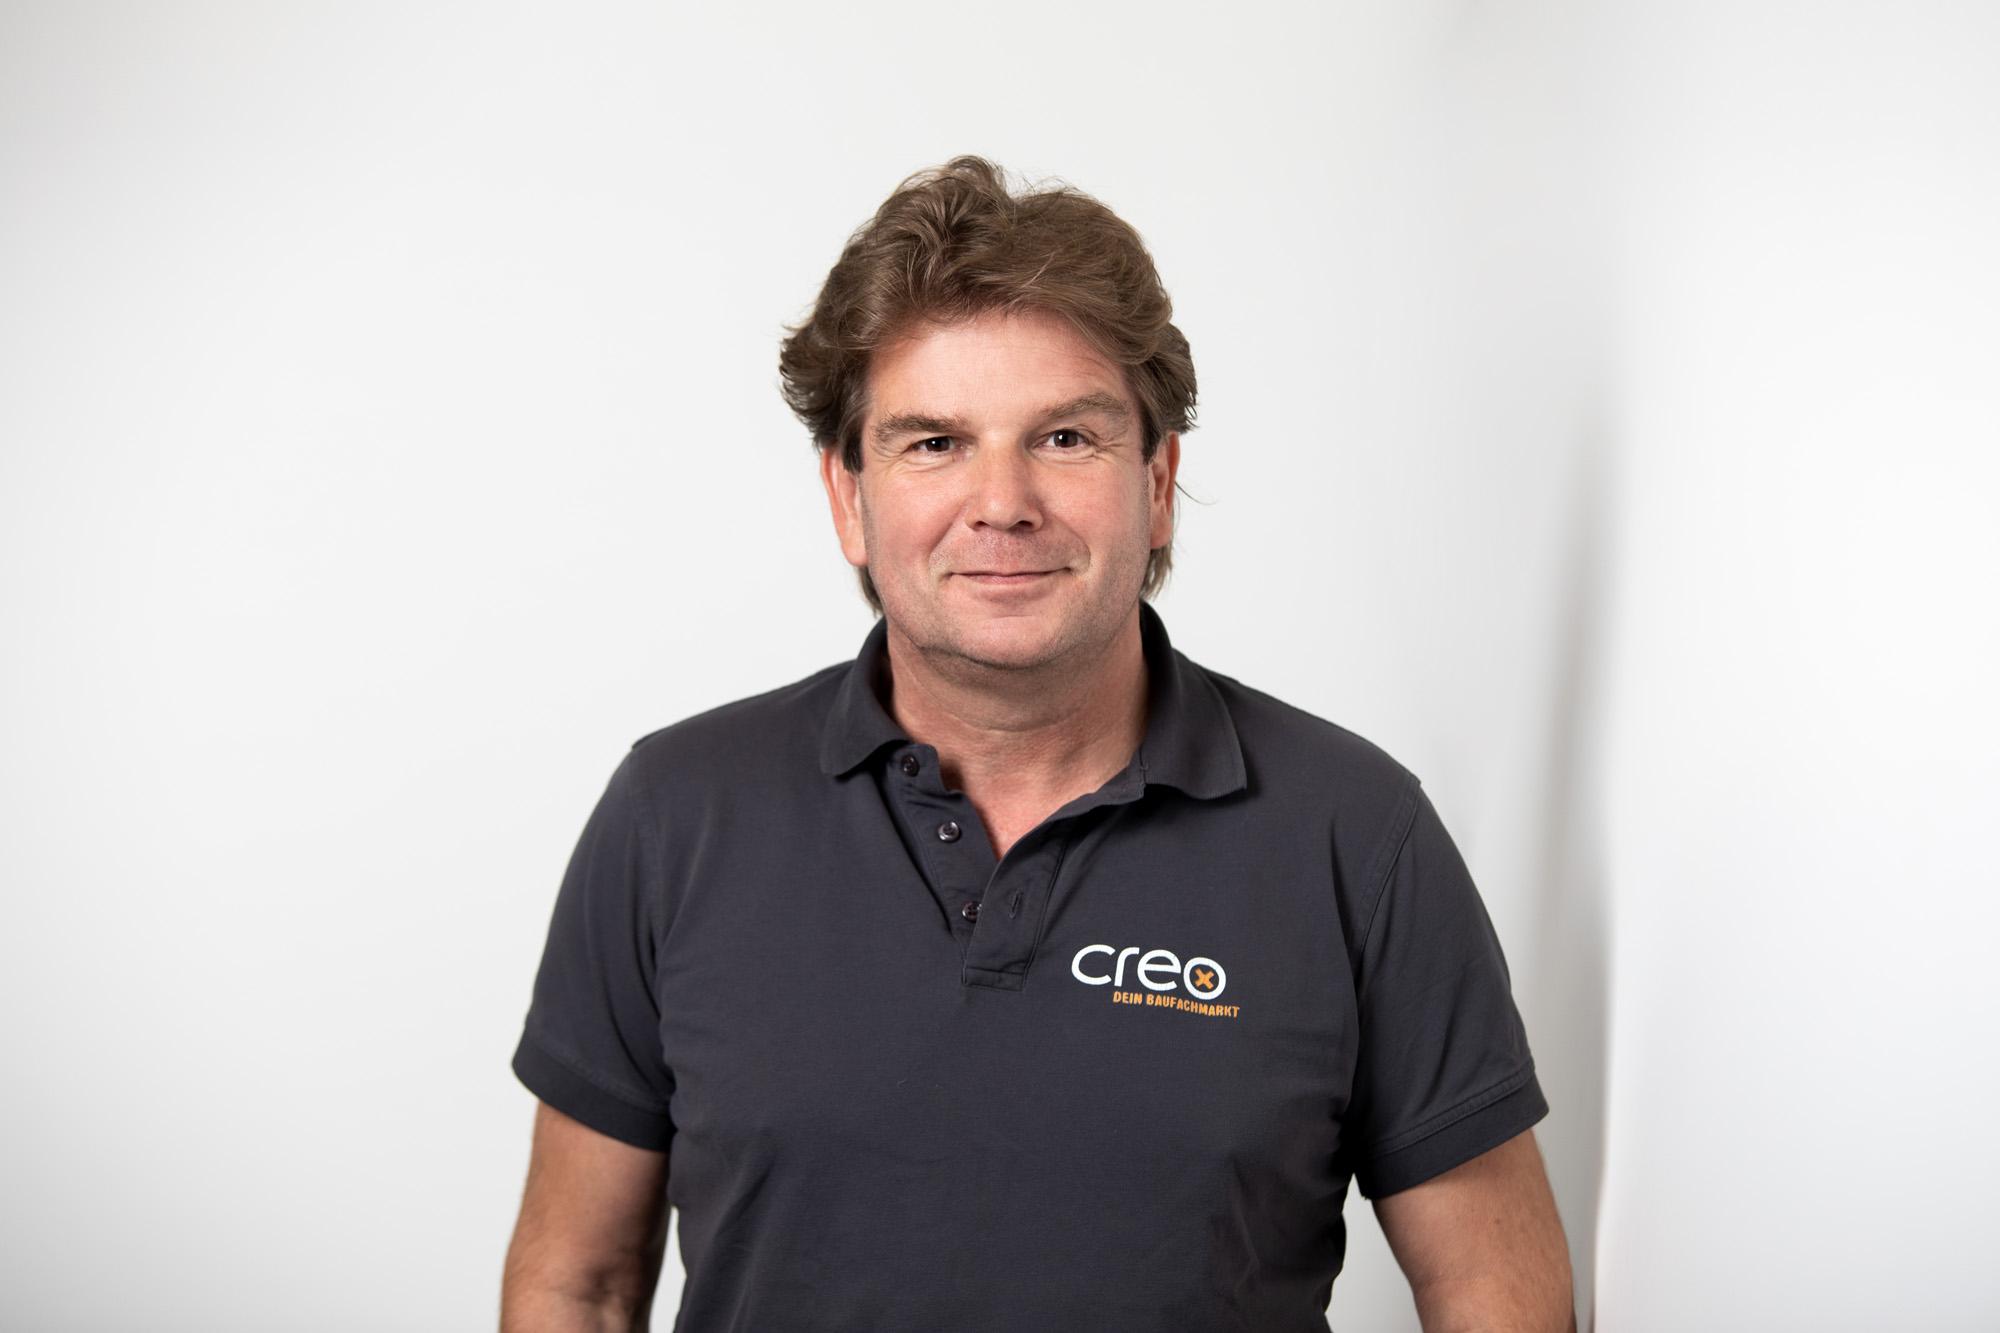 Carl-Georg Heinemann